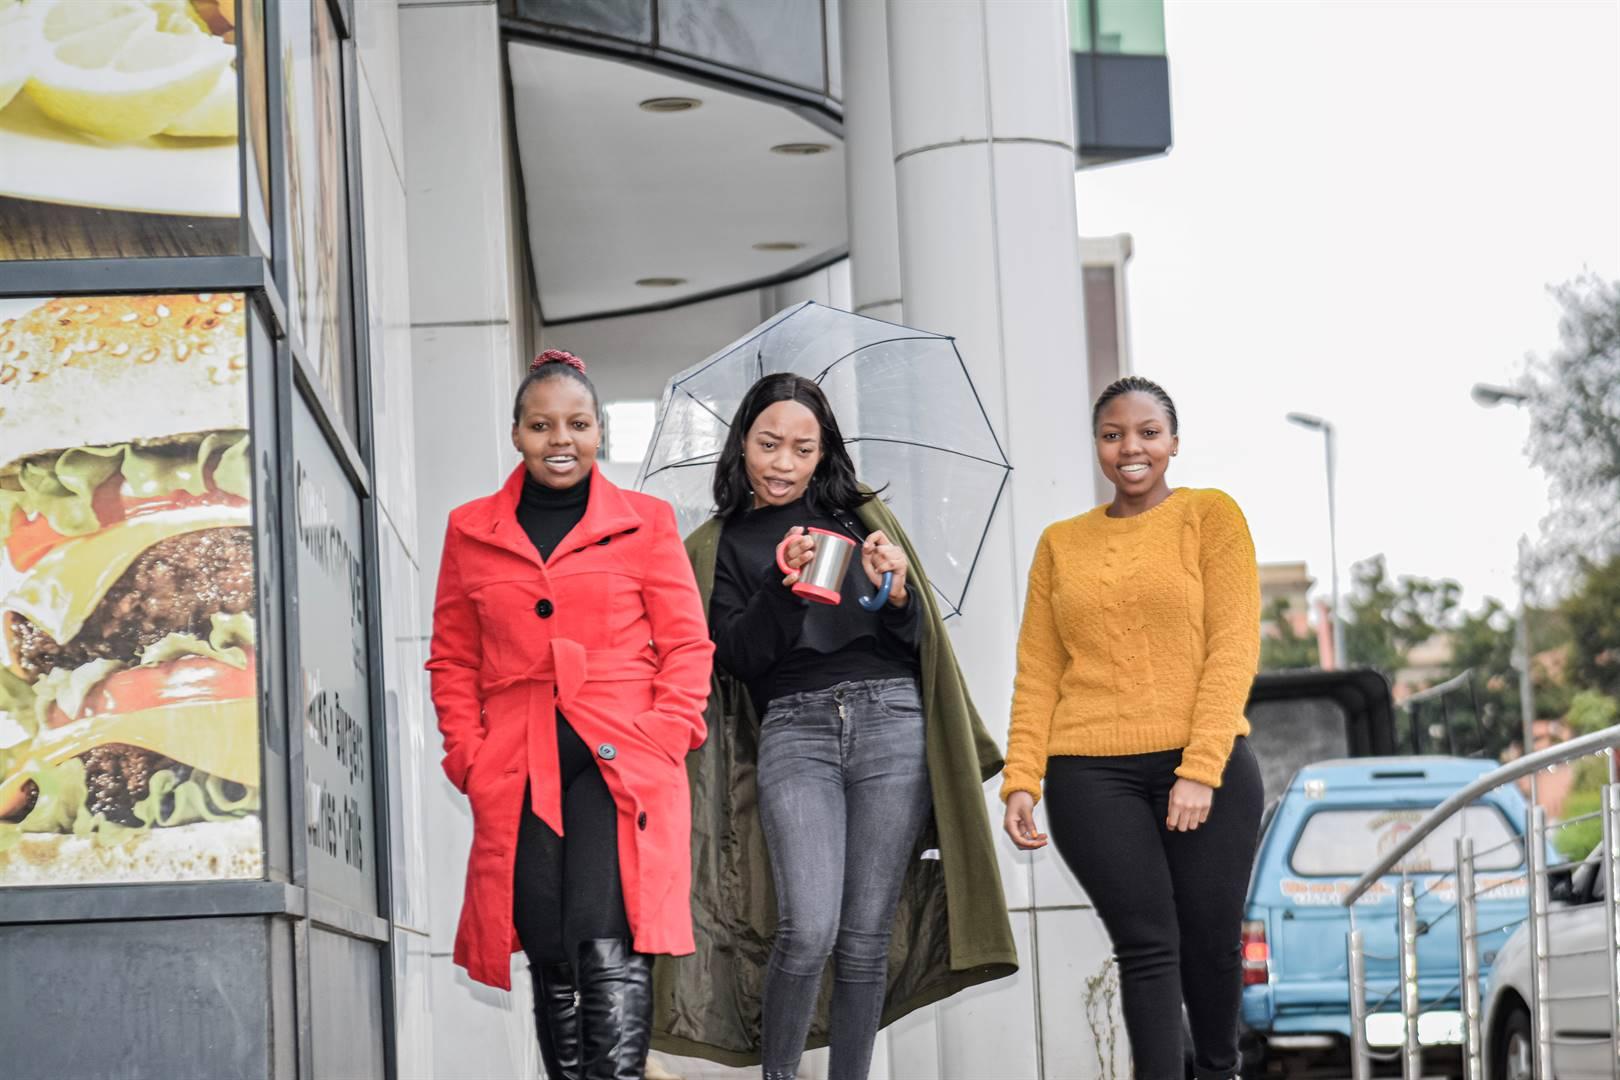 Thabile Maphalala, Xolile Sibiya and Ntando Dlamini enjoyed their lunch break in the cold weather in the Pietermaritzburg CBD yesterday.